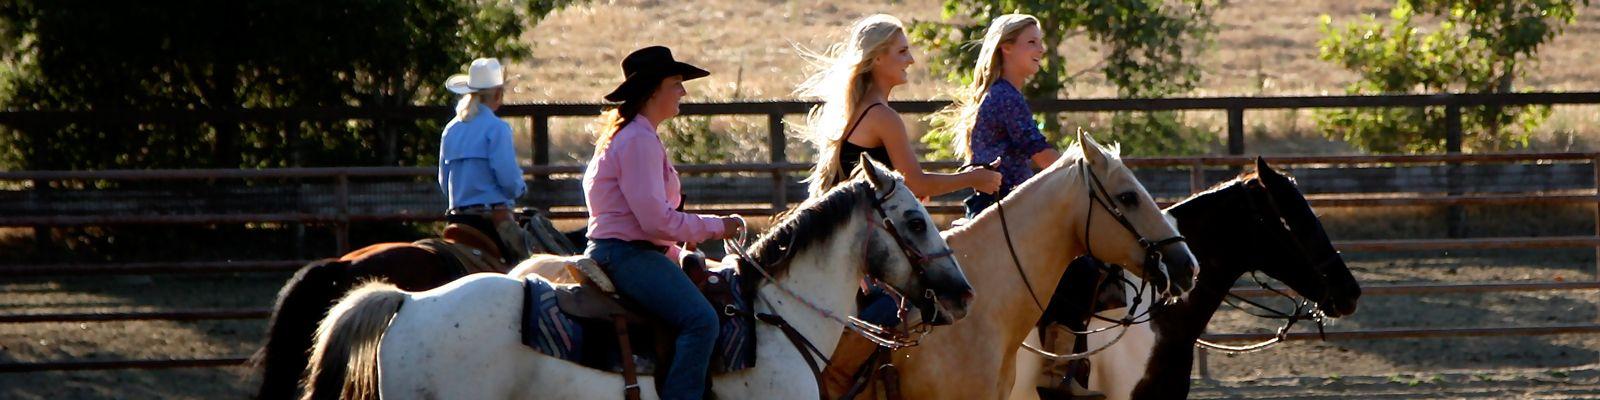 Escape to Alisal and experience the best Santa Barbara horseback riding Santa Ynez Valley, California has to offer.